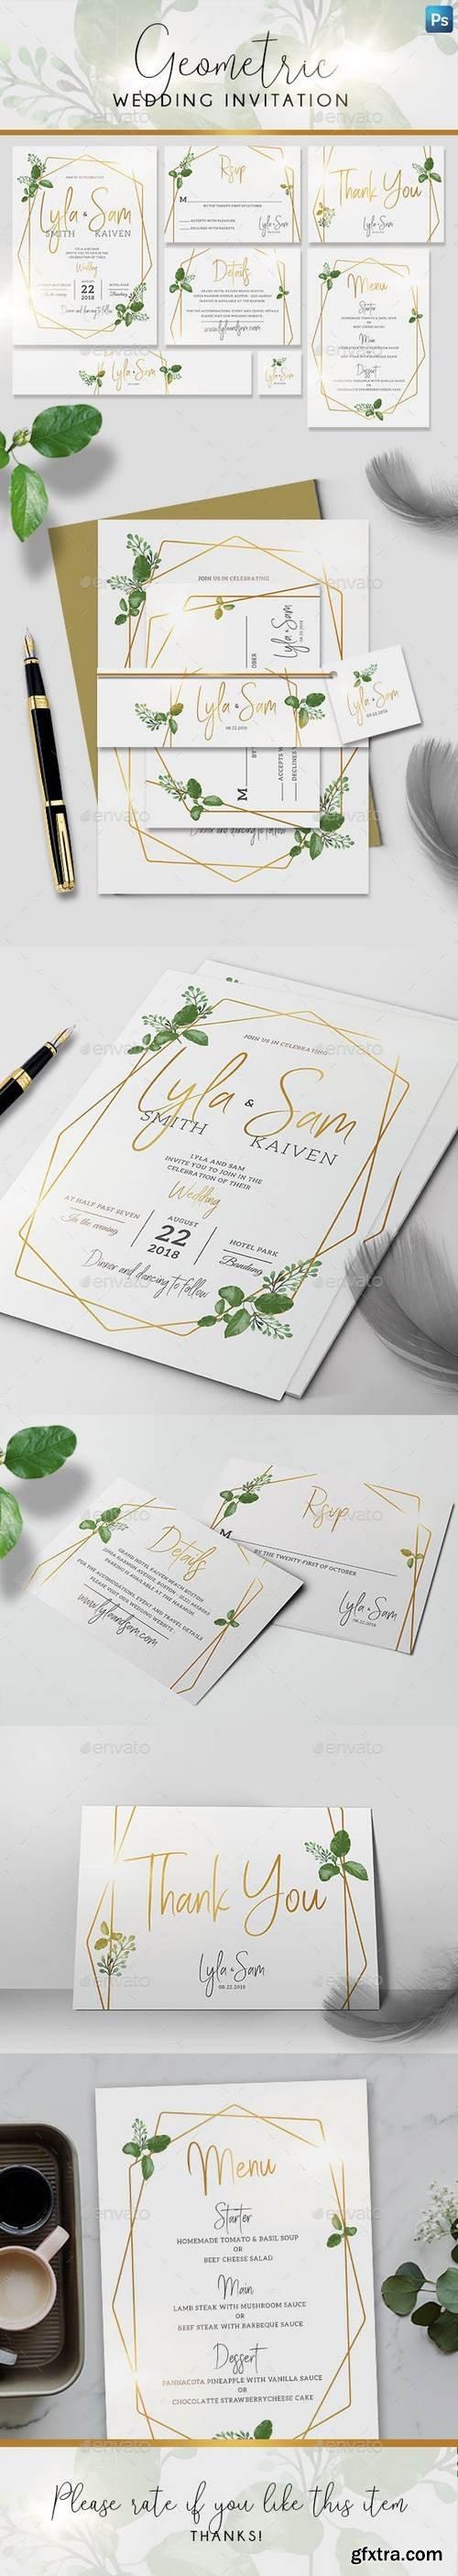 Graphicriver - Geometric Wedding Invitation 21620415